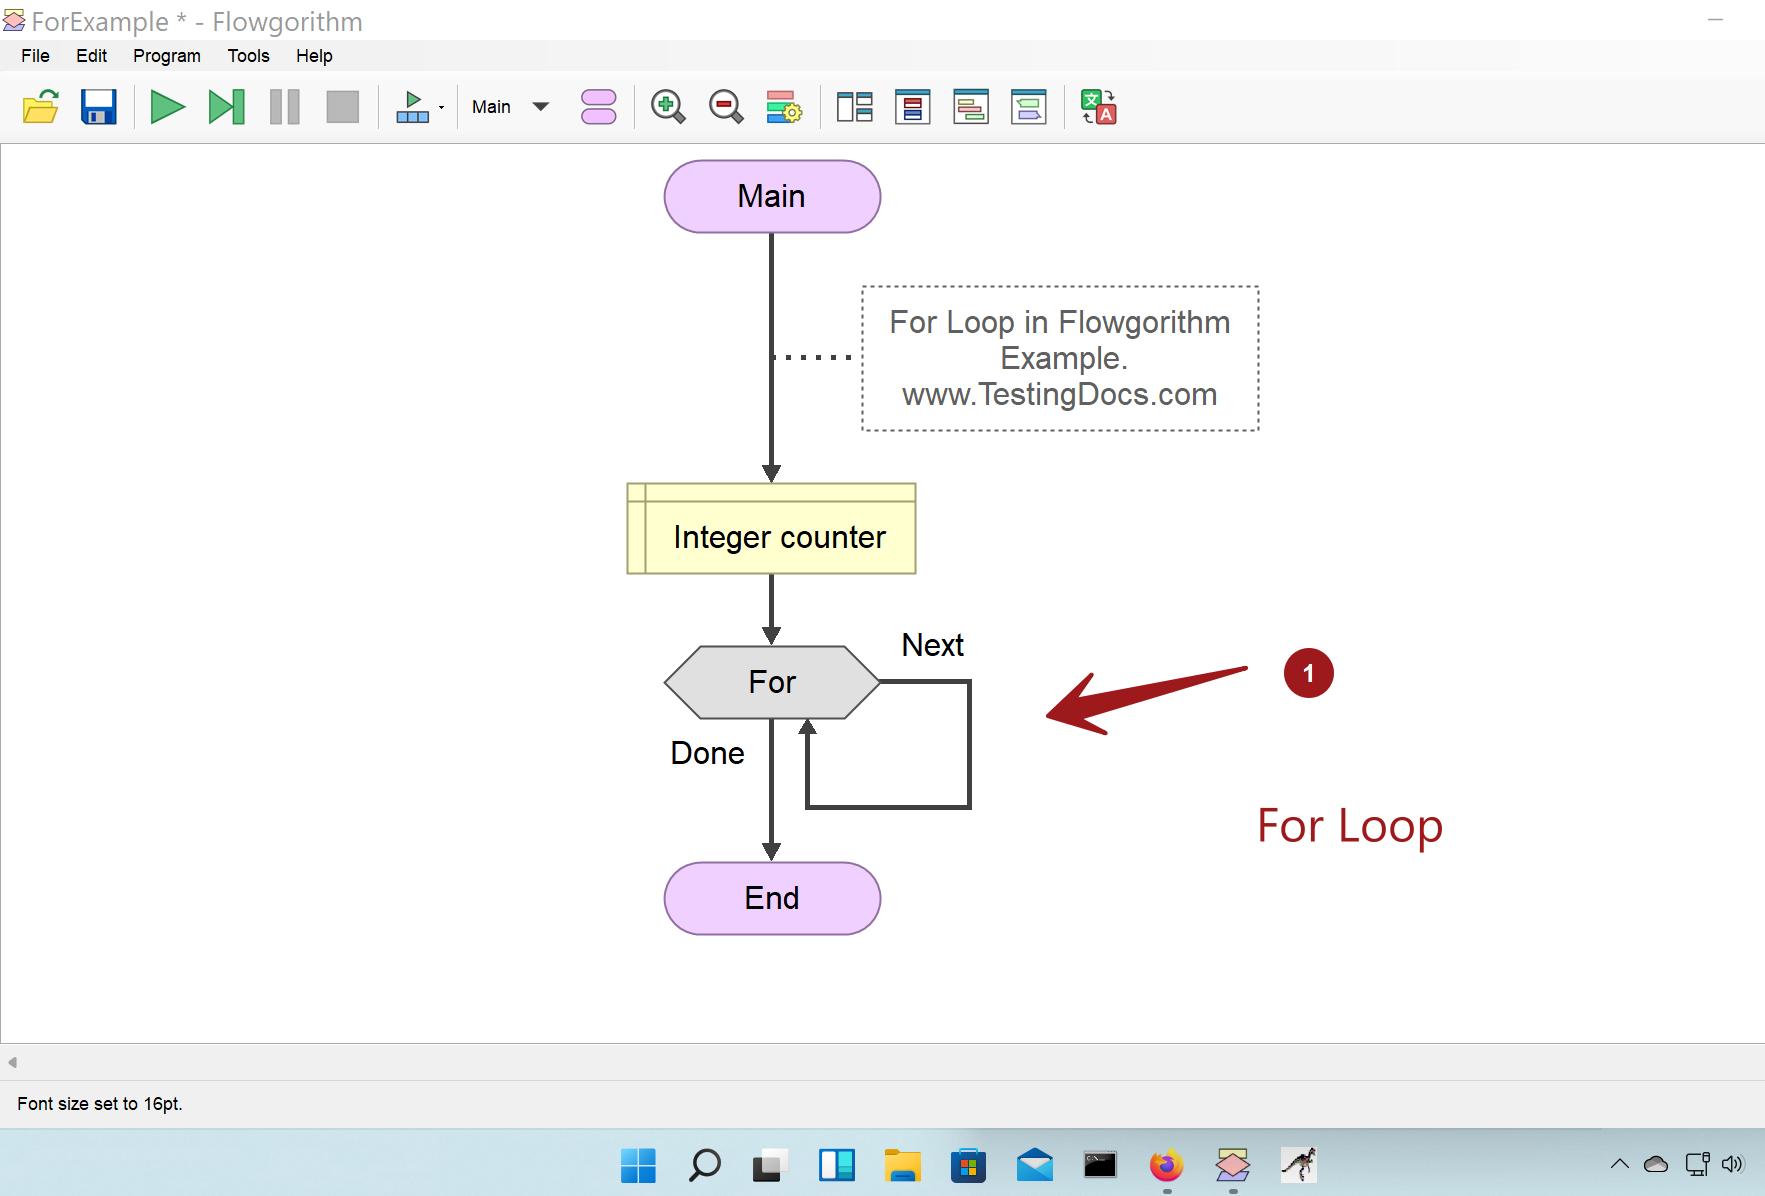 For Loop Flowgorithm